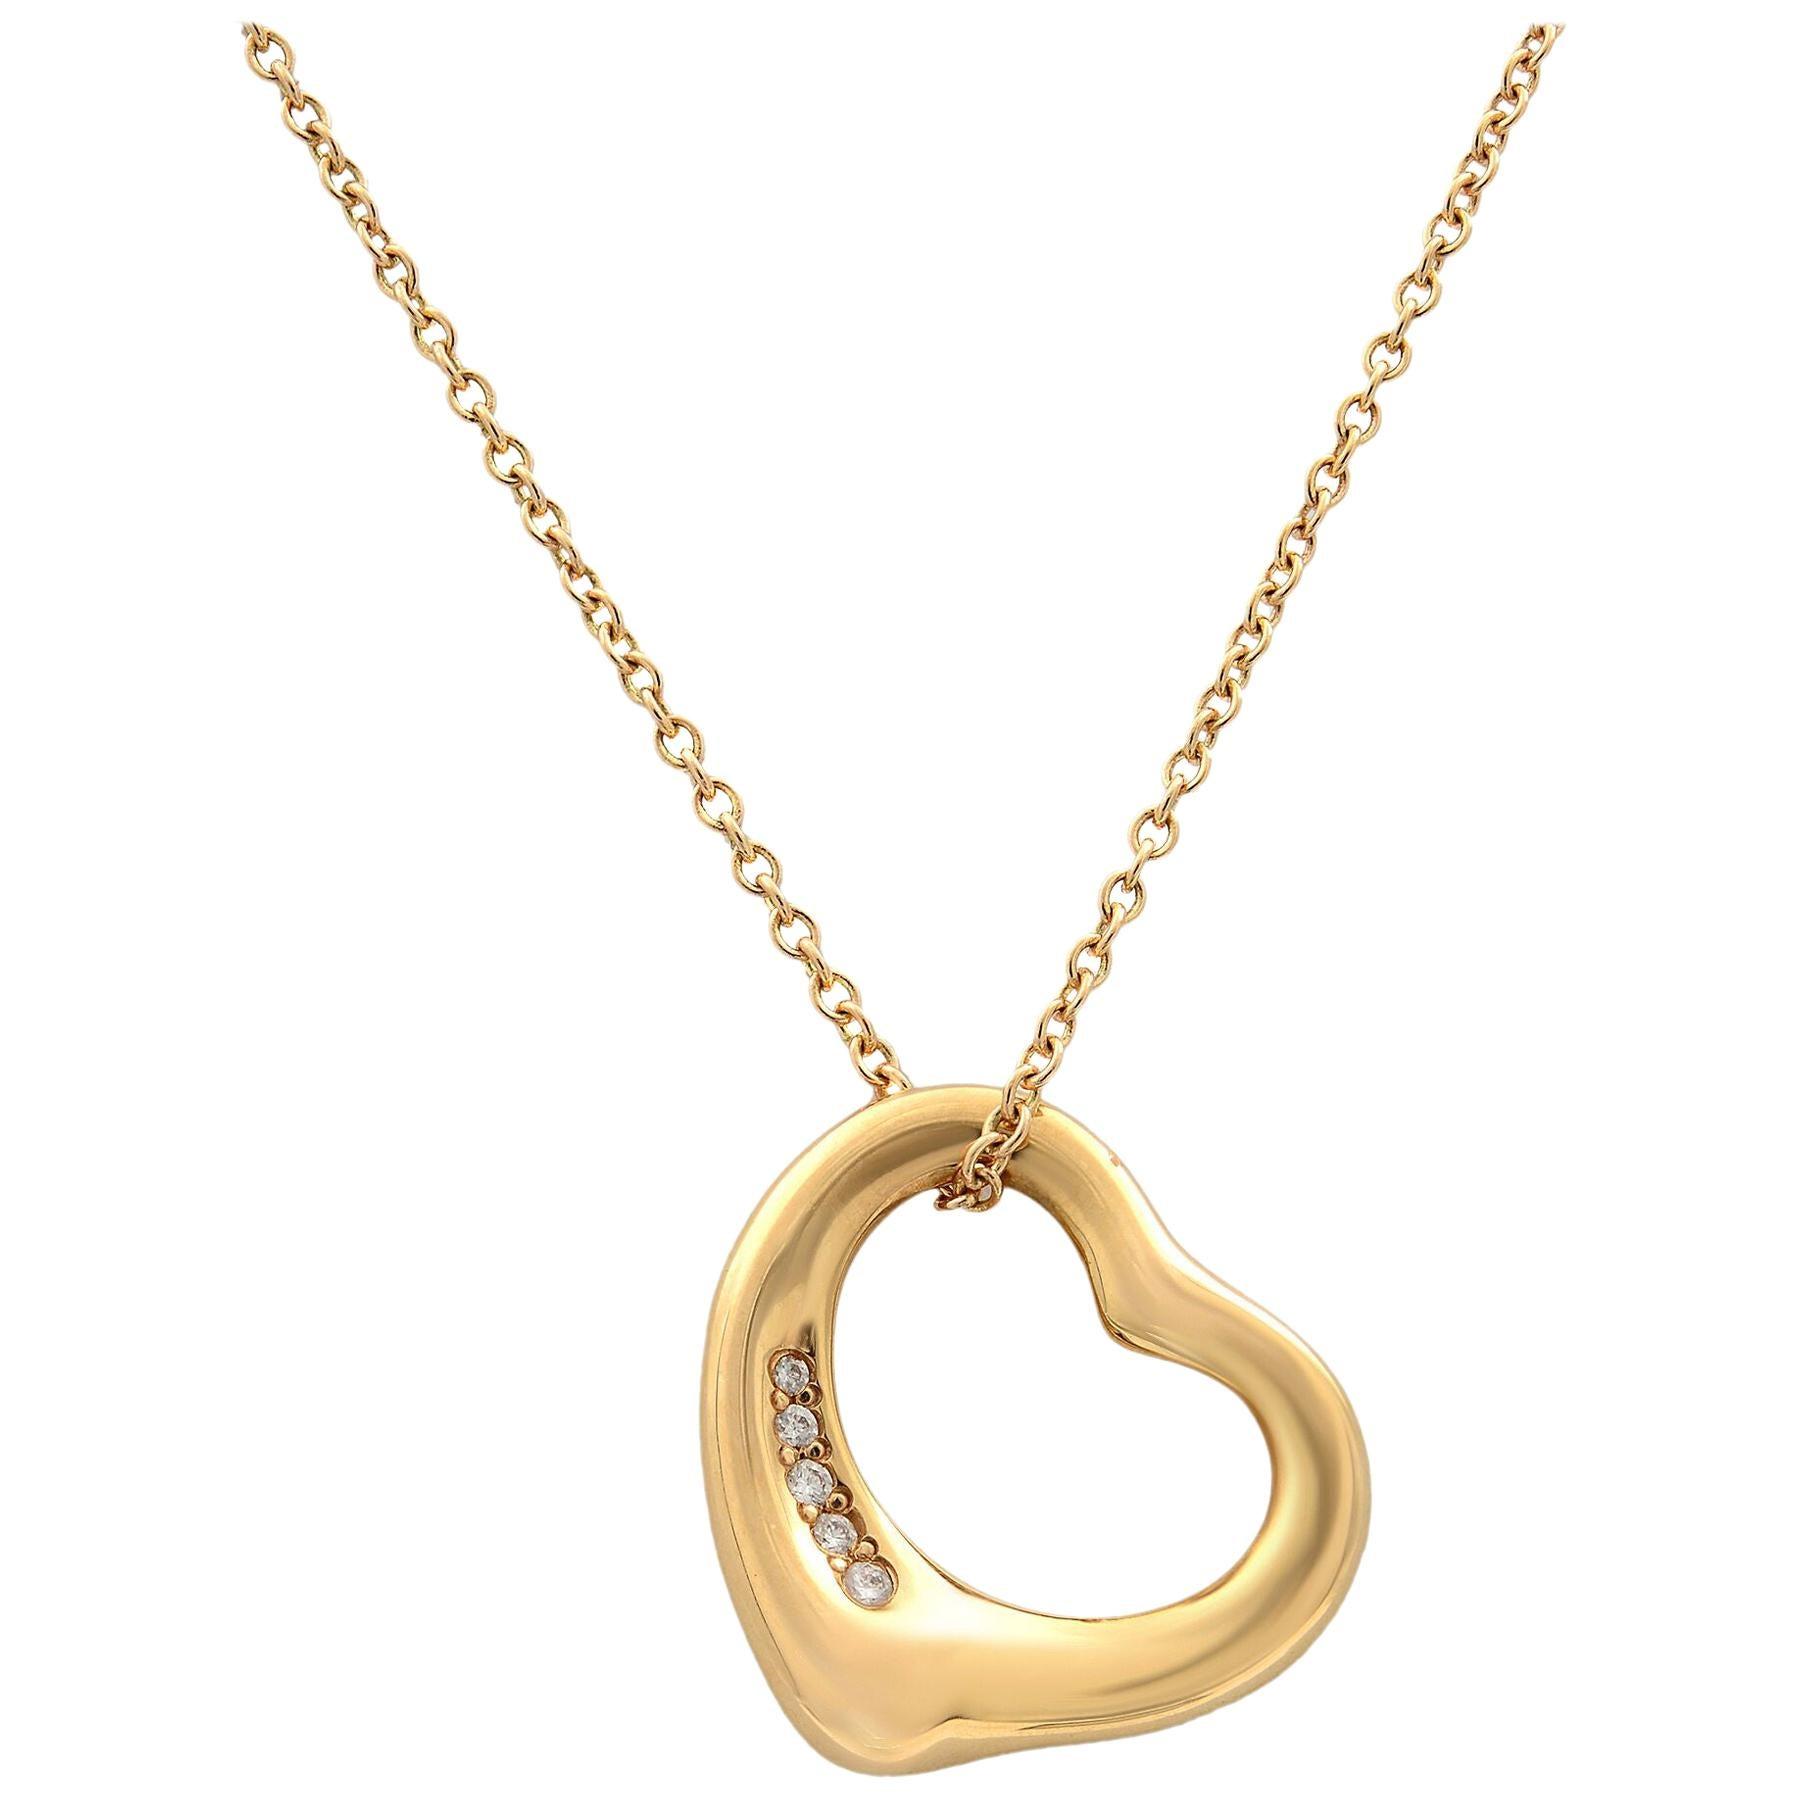 Tiffany & Co. 18 Karat Rose Gold Elsa Peretti Open Heart Pendant 0.02 Carat